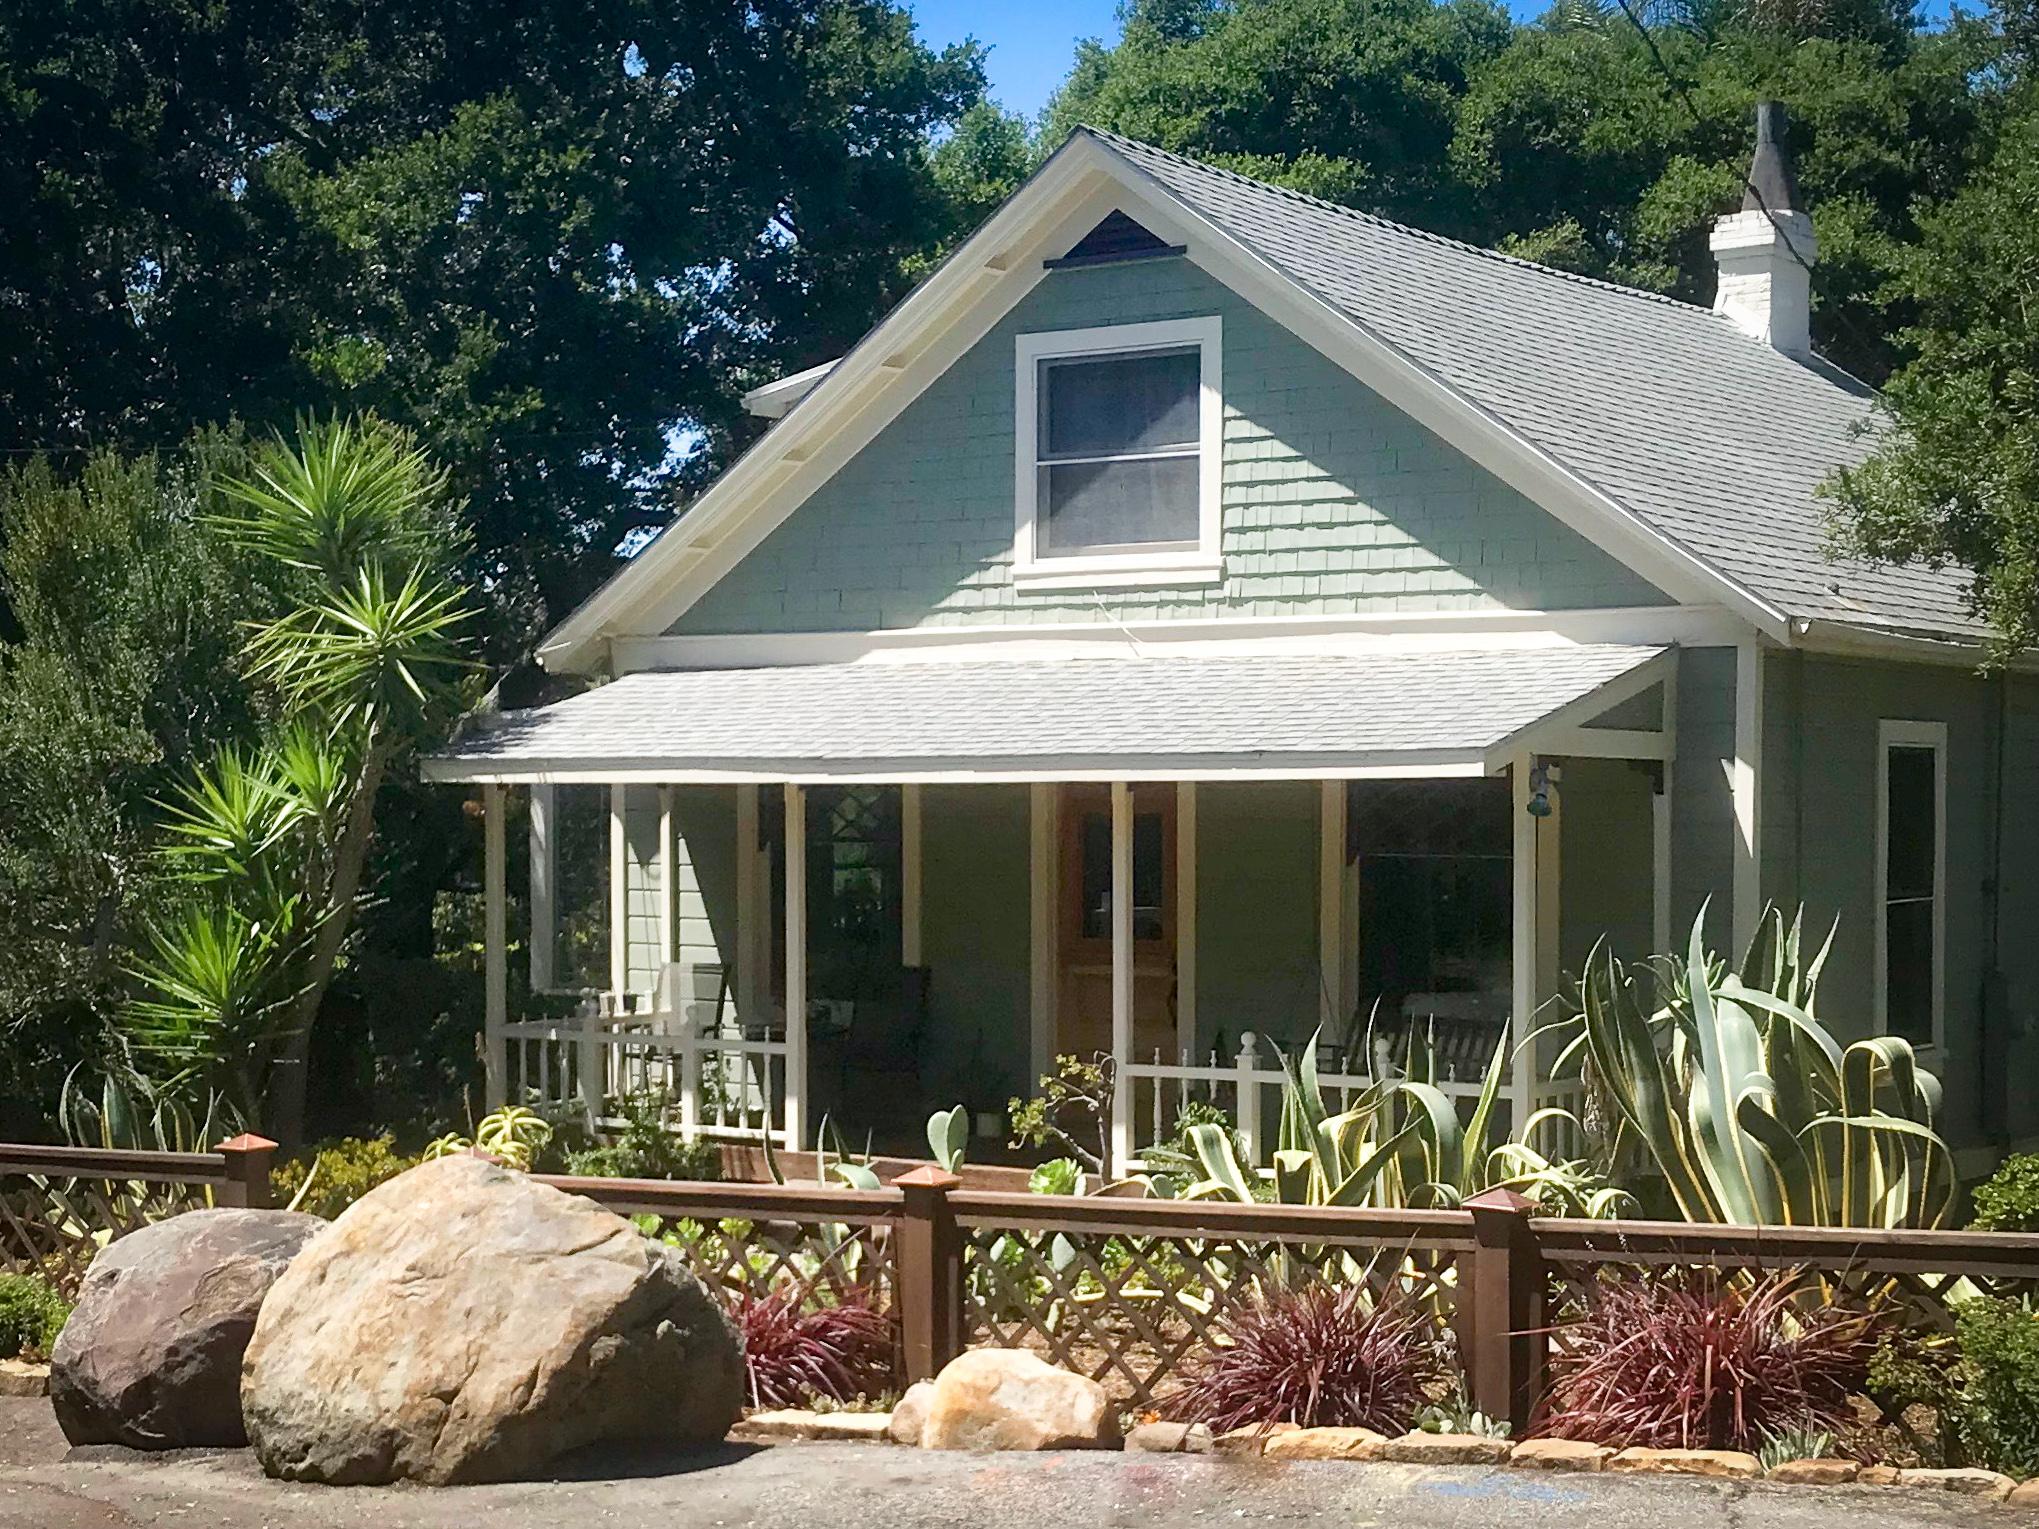 Santa Barbara victorian.jpg